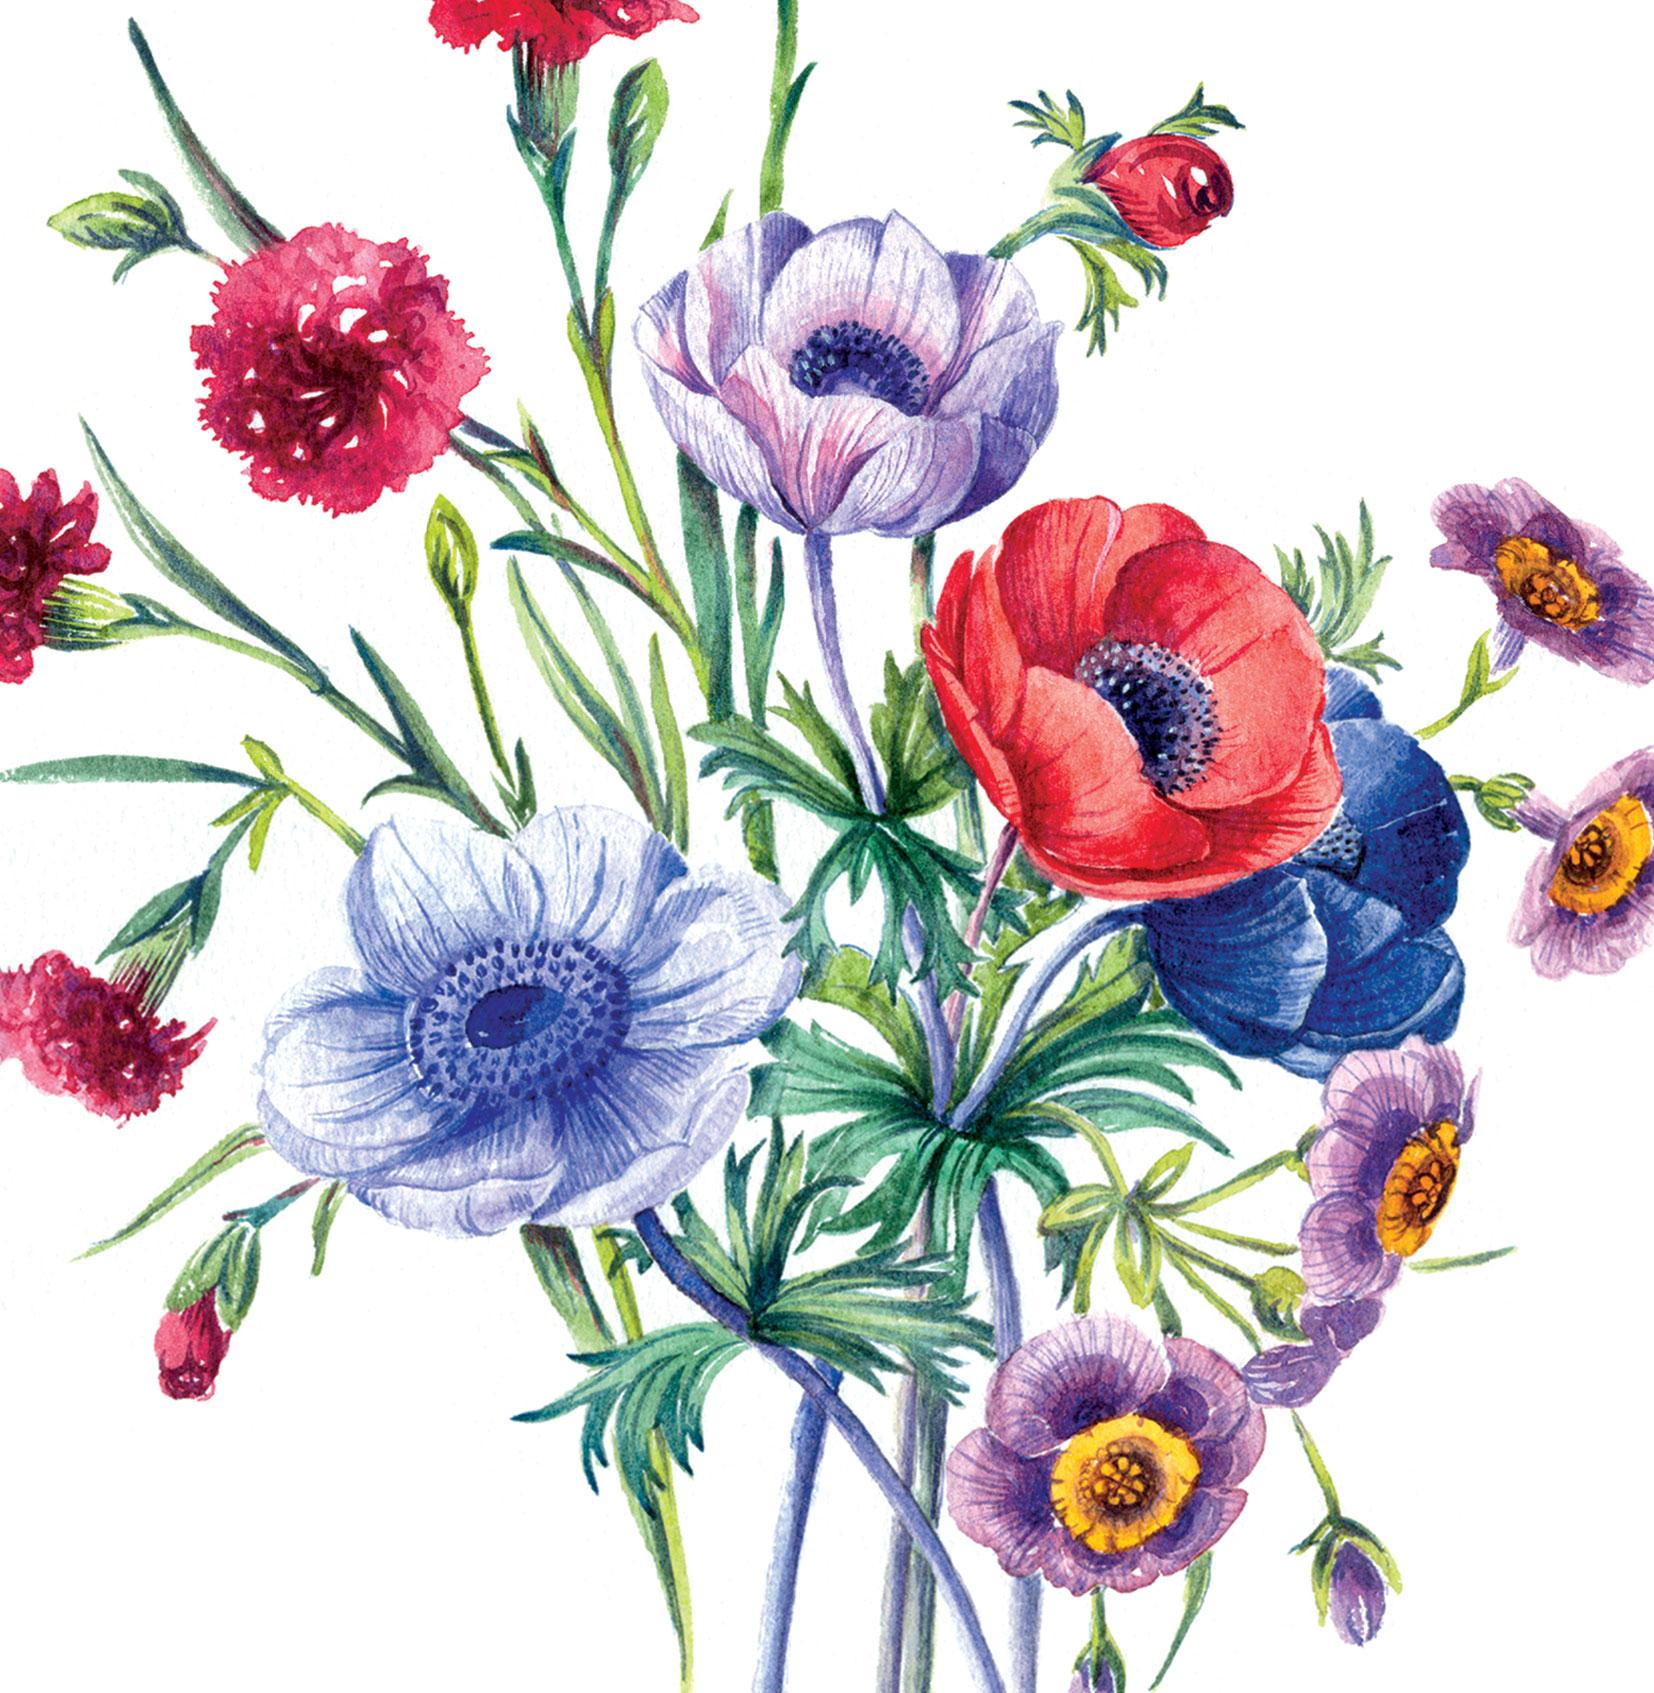 Anemones+carnations.jpg